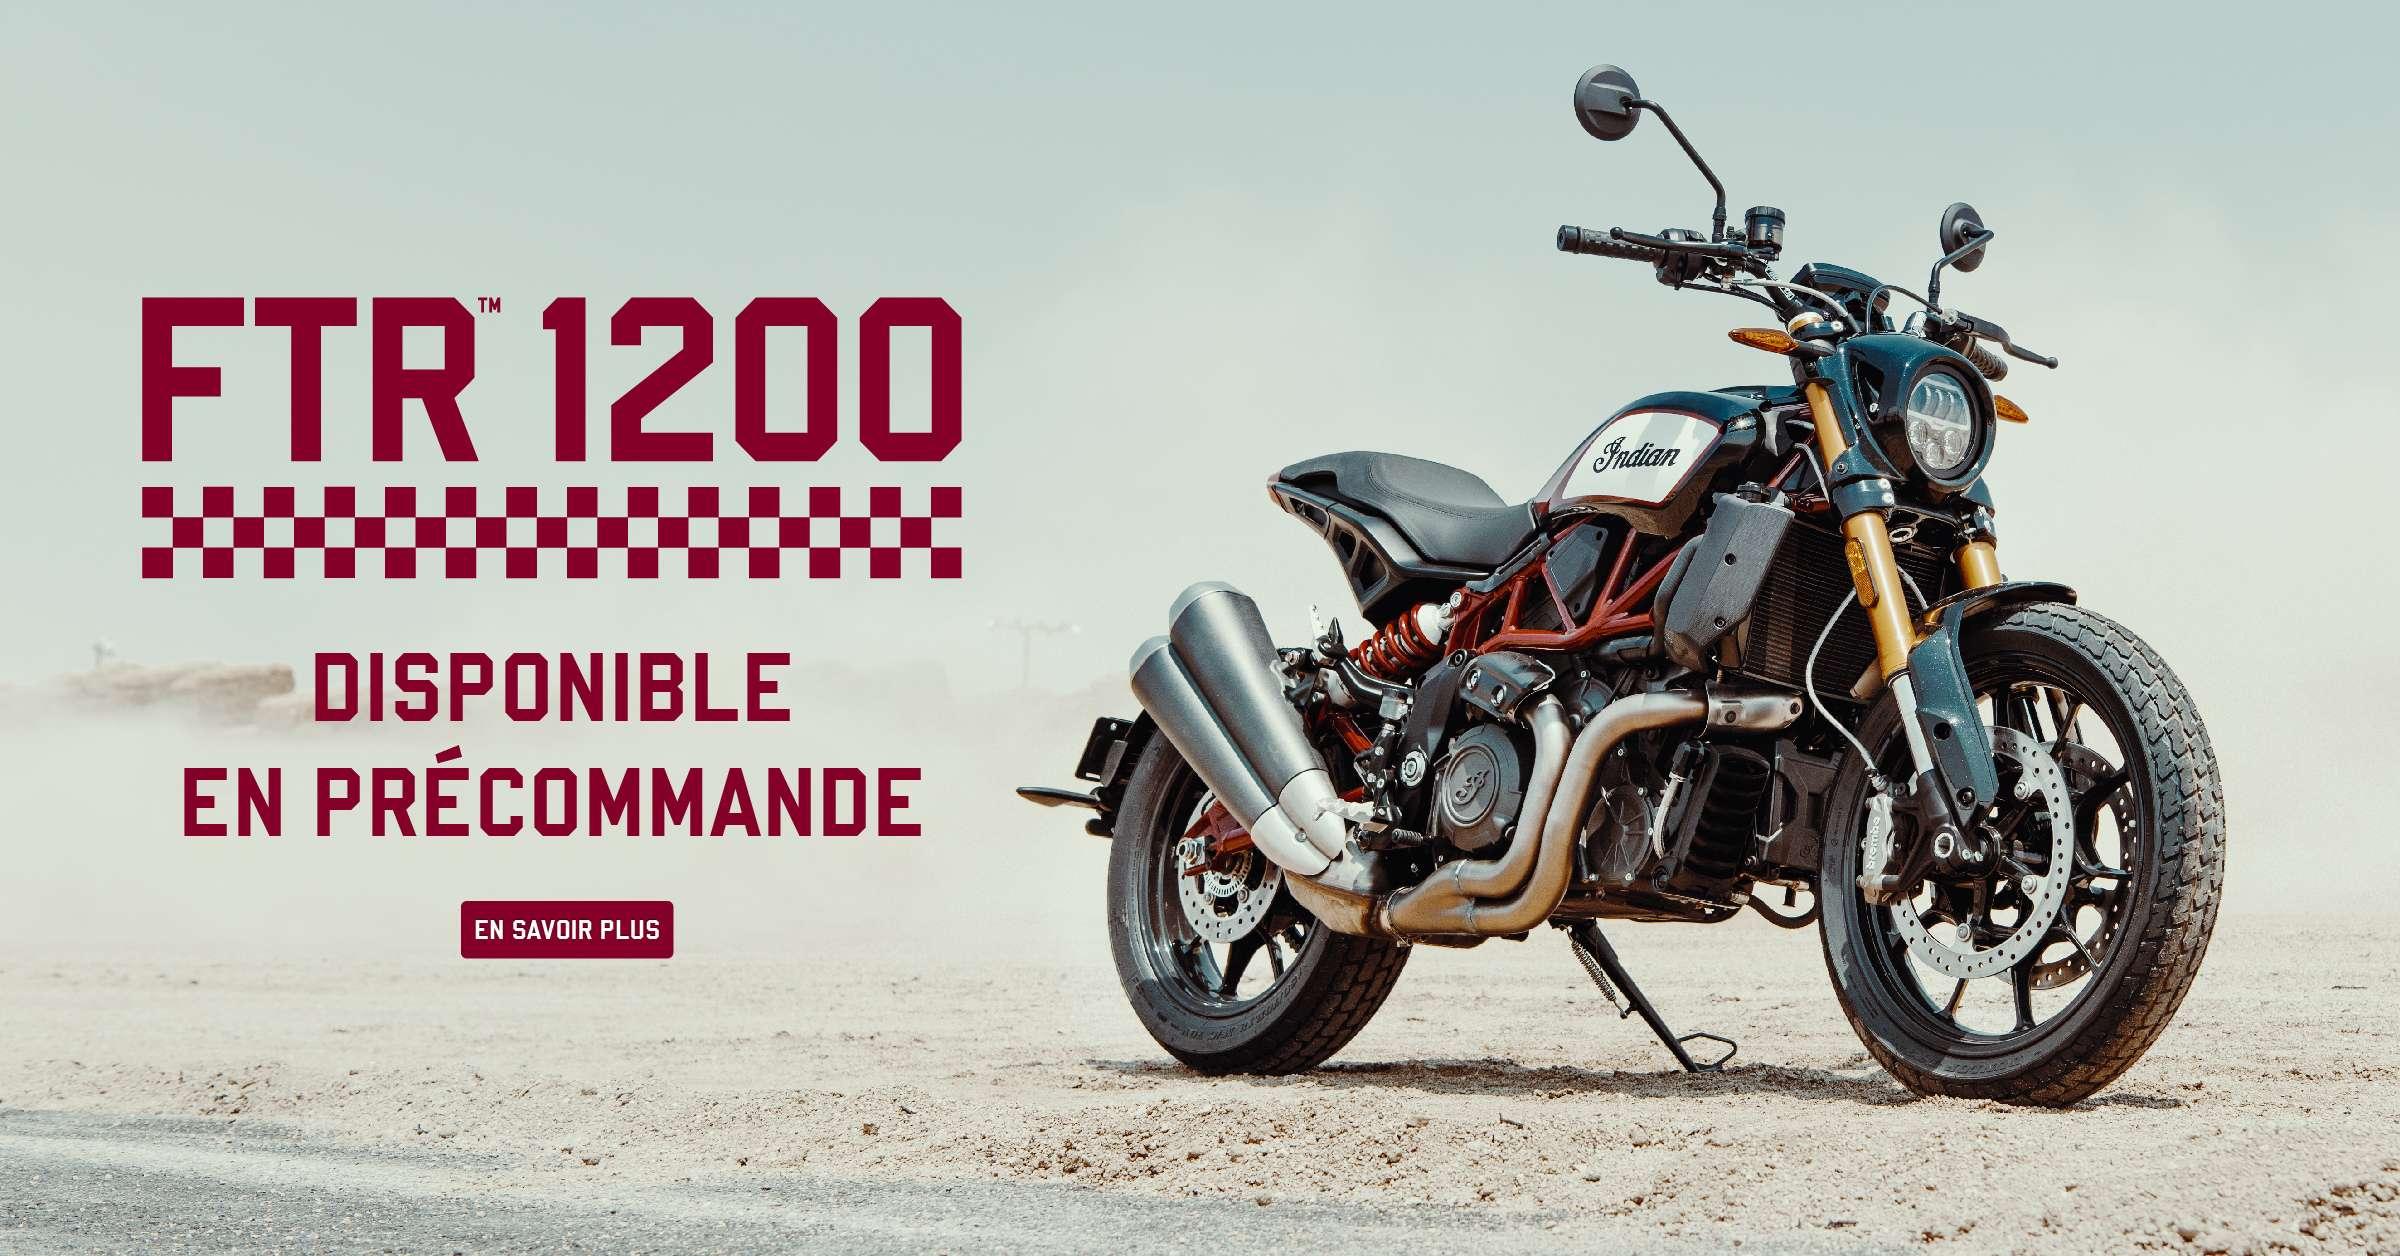 FTR 1200 d'Indian Motorcycle: une pure merveille